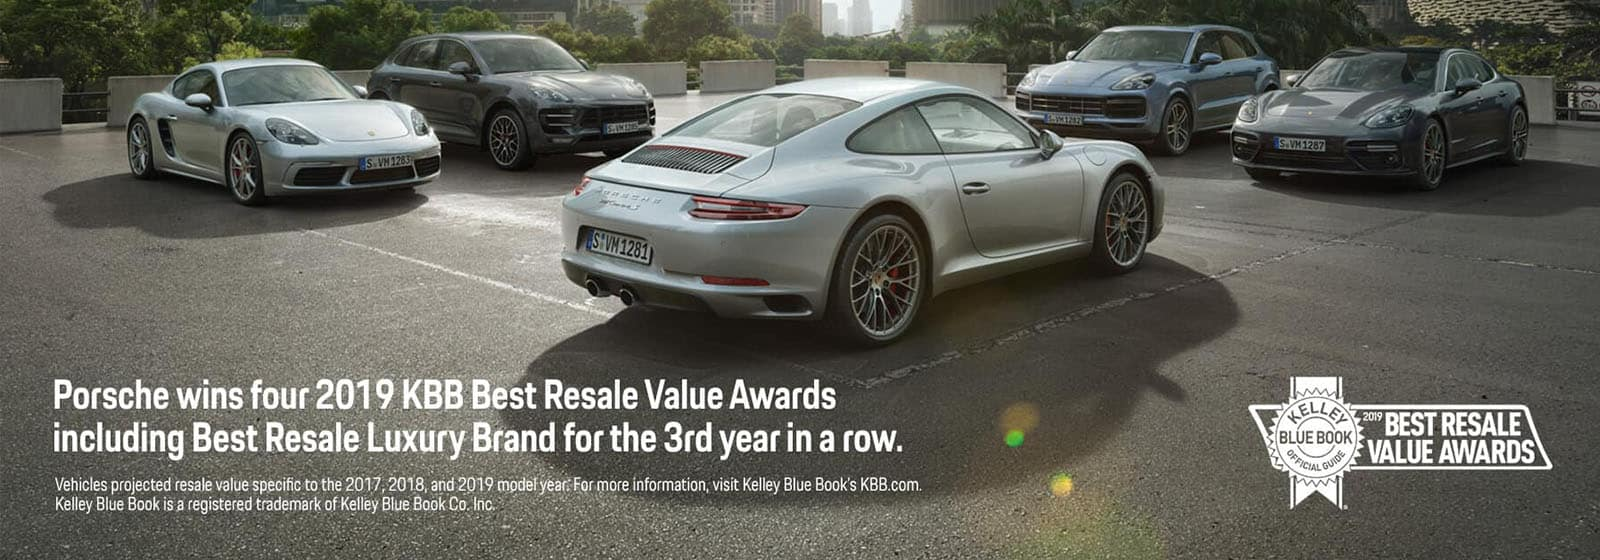 Porsche best resale value home banner